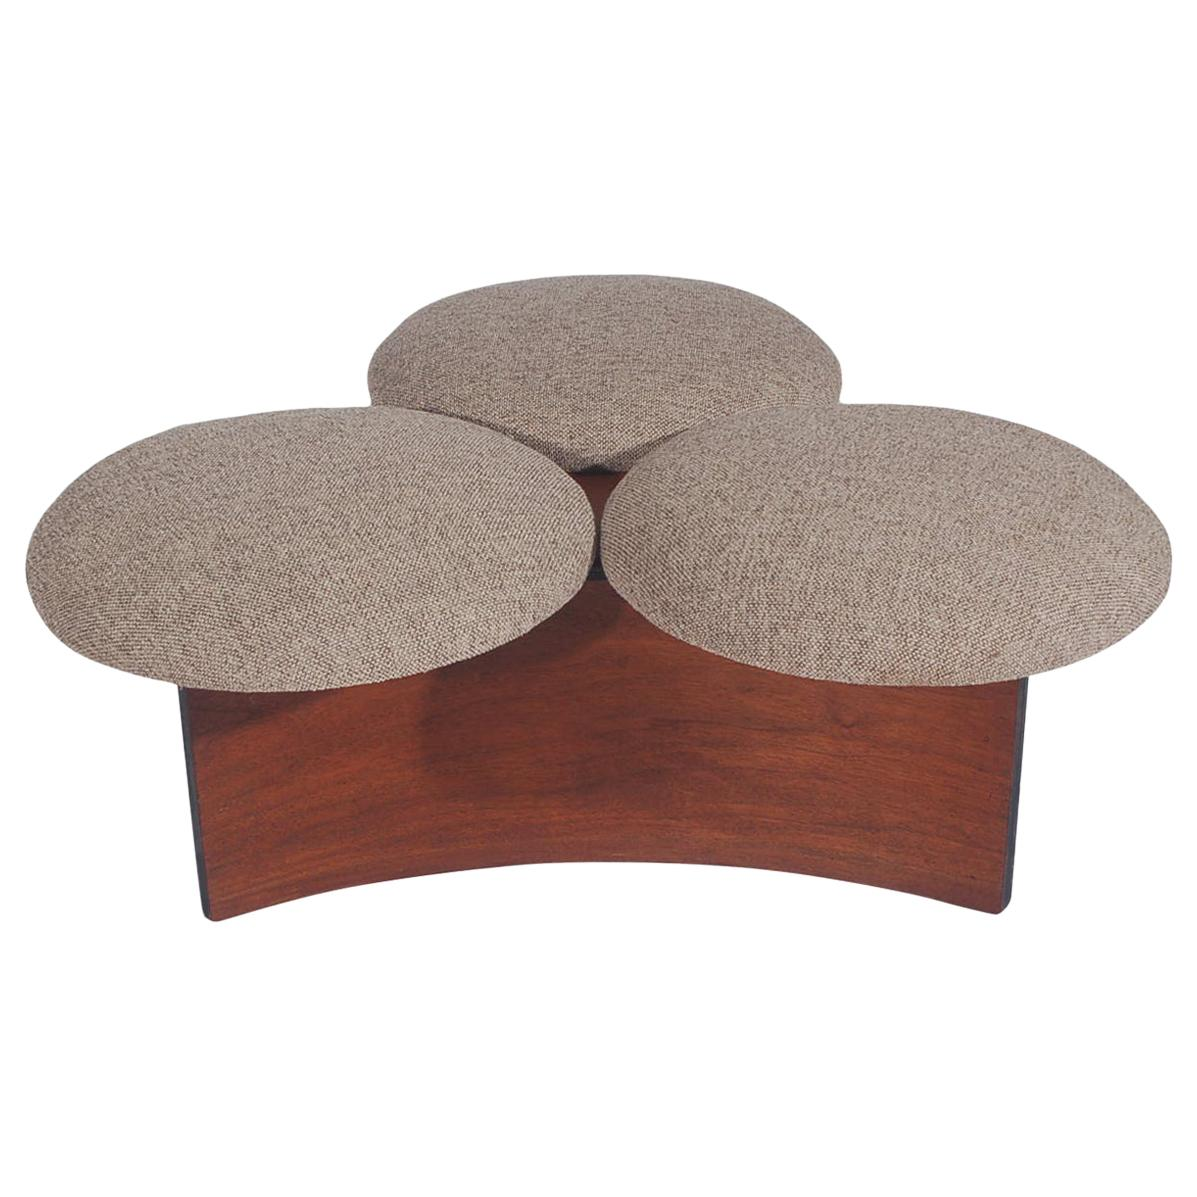 Midcentury Danish Modern Ottoman or Table in Walnut with 3 Circular Cushions